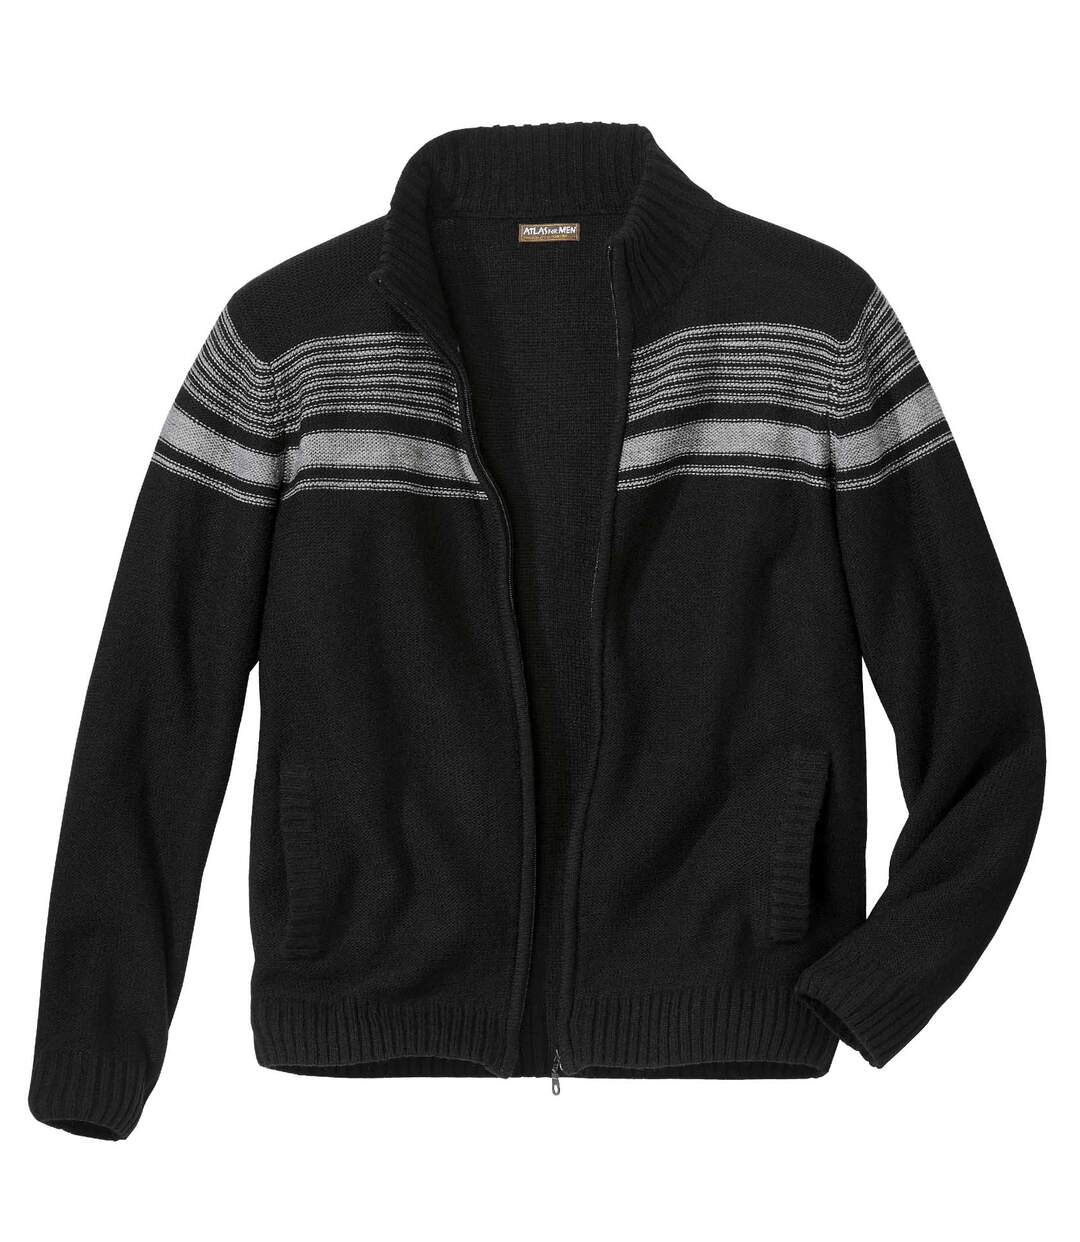 Pletený sveter na zips West City